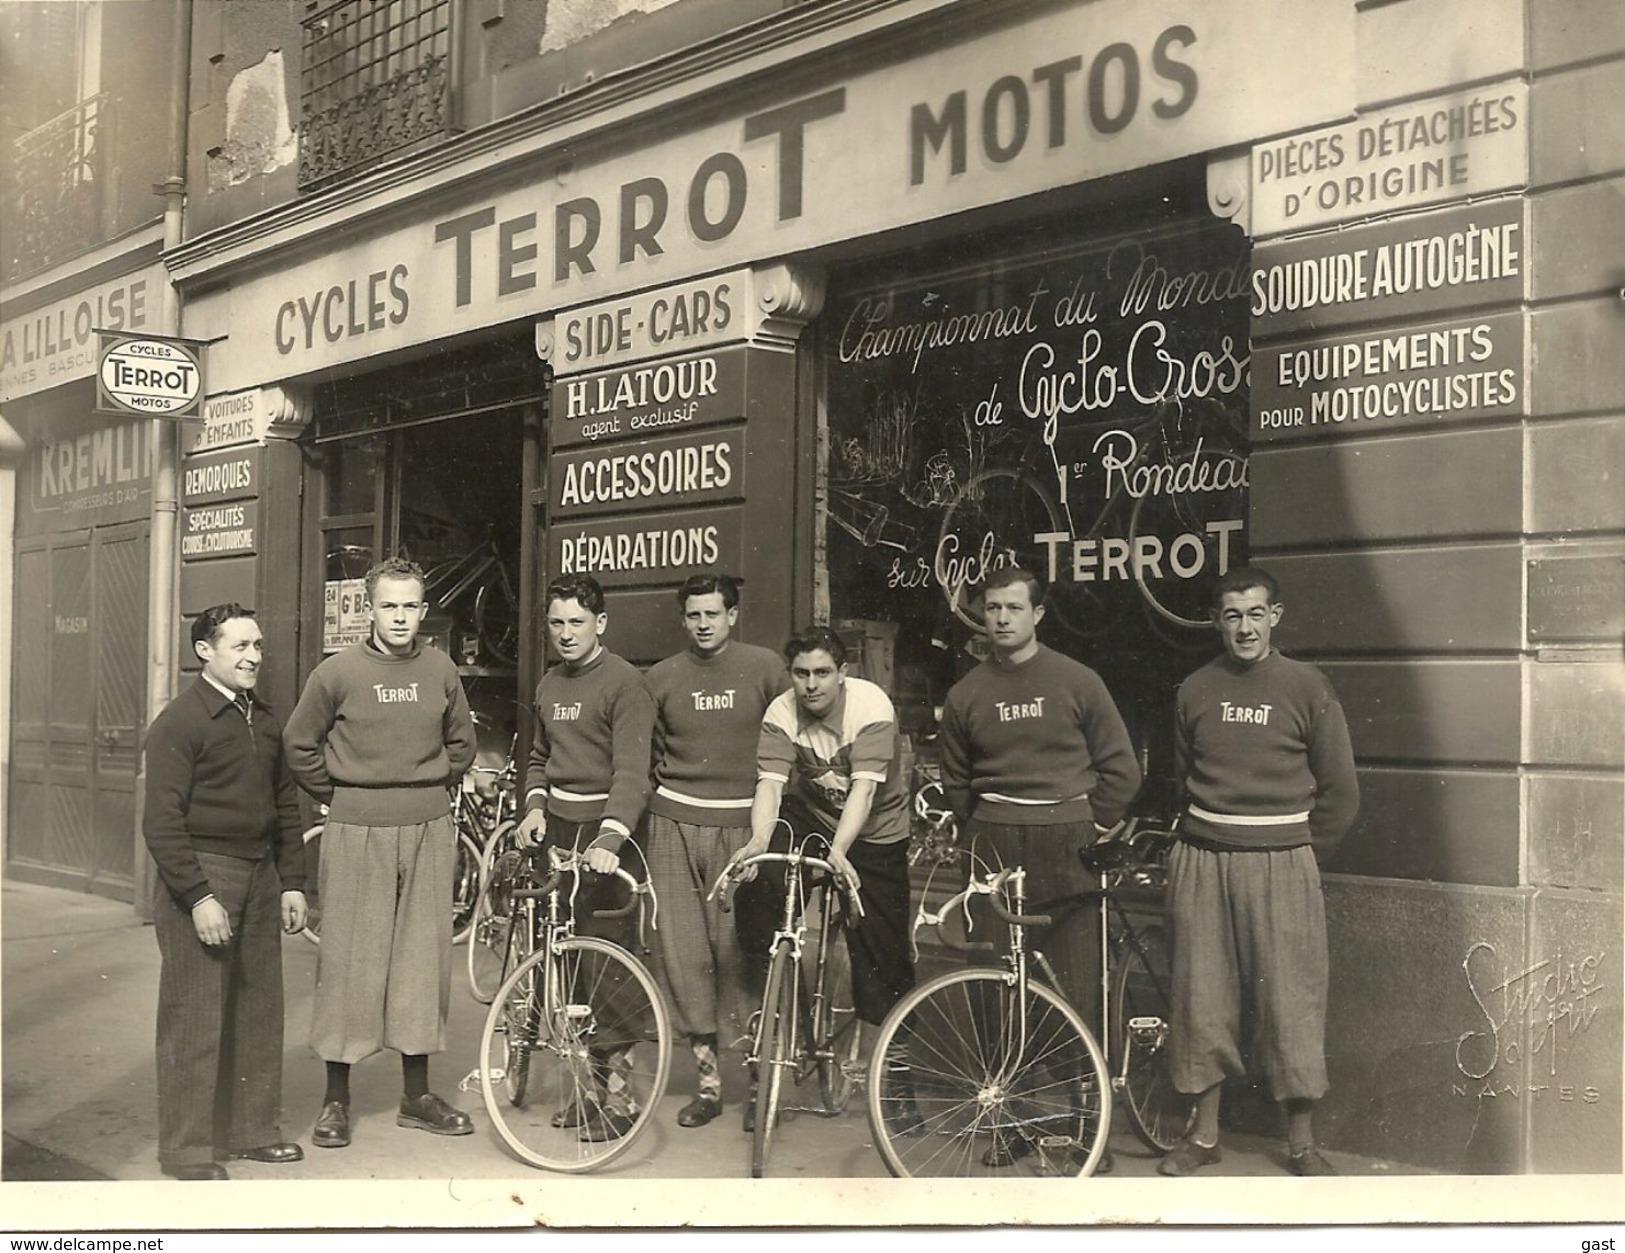 44 NANTES CYCLES ET MOTOS TERROT H. LATOUR AGENT EXCLUSIF ET L EQUIPE TERROT   5 BOULEVARD VICTOR HUGO  TELE  71  05 24 - Cyclisme